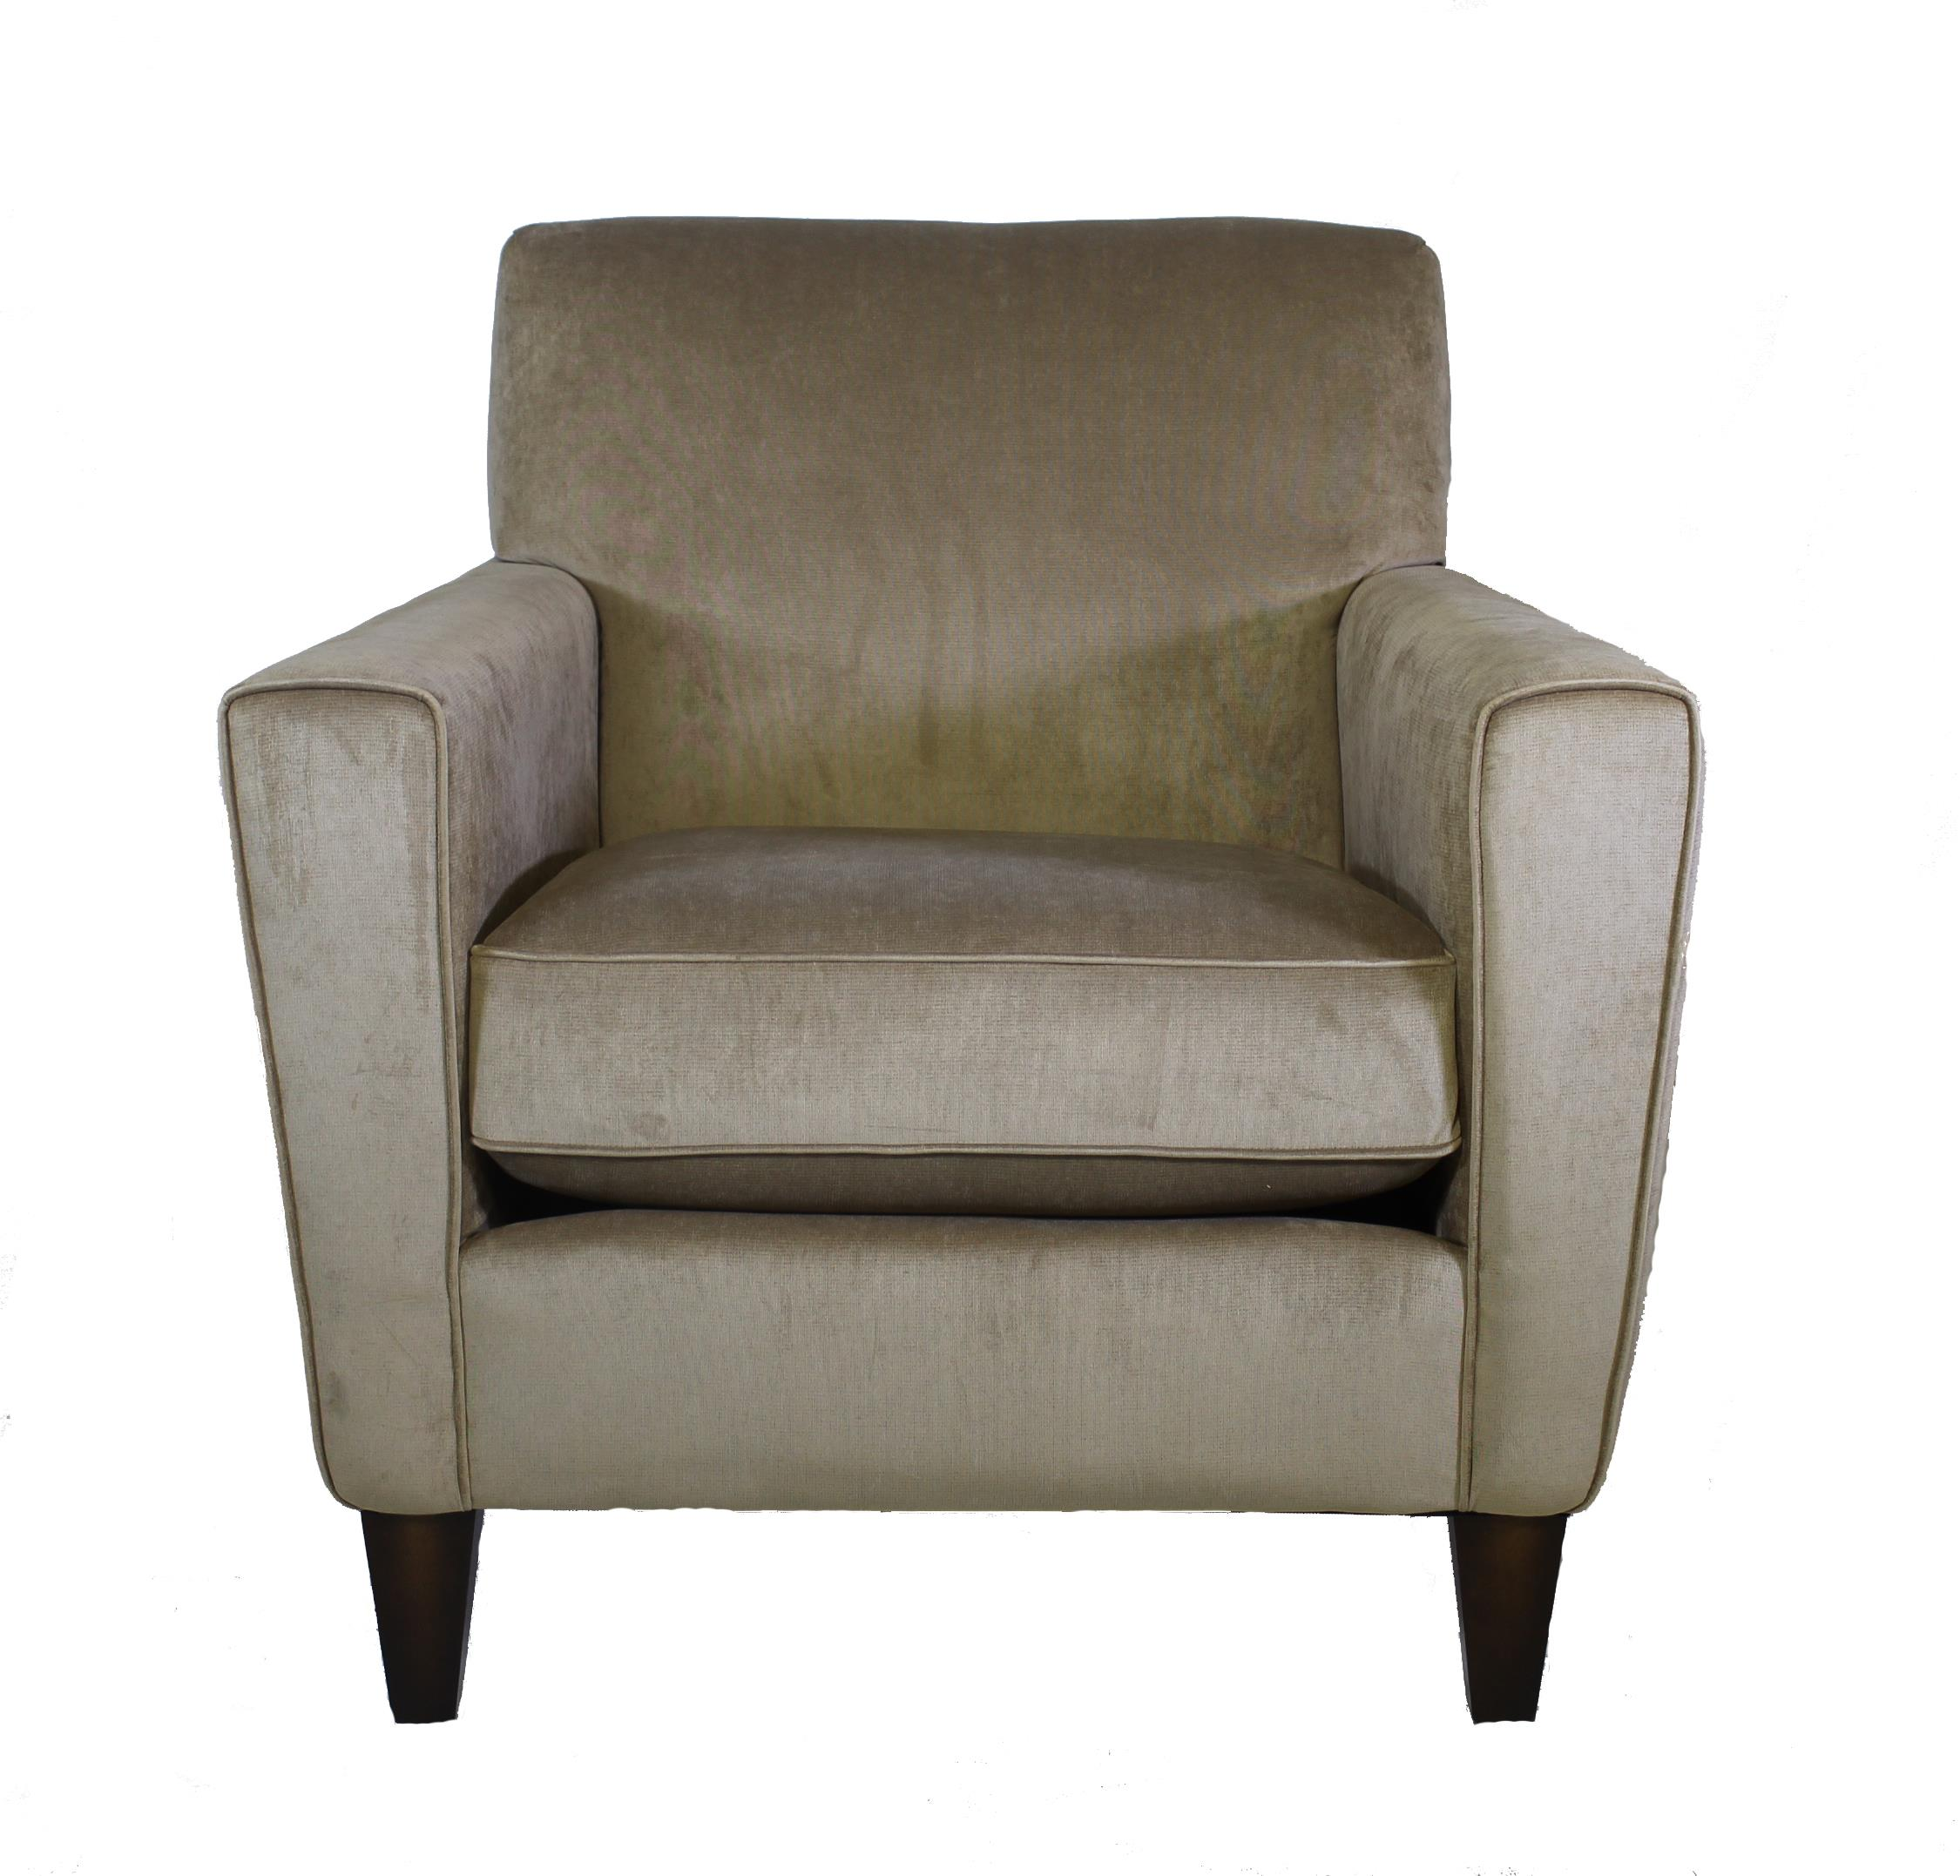 Flexsteel Furniture Telephone Number: Flexsteel Digby Sofa Digby Fenton Home Furnishings